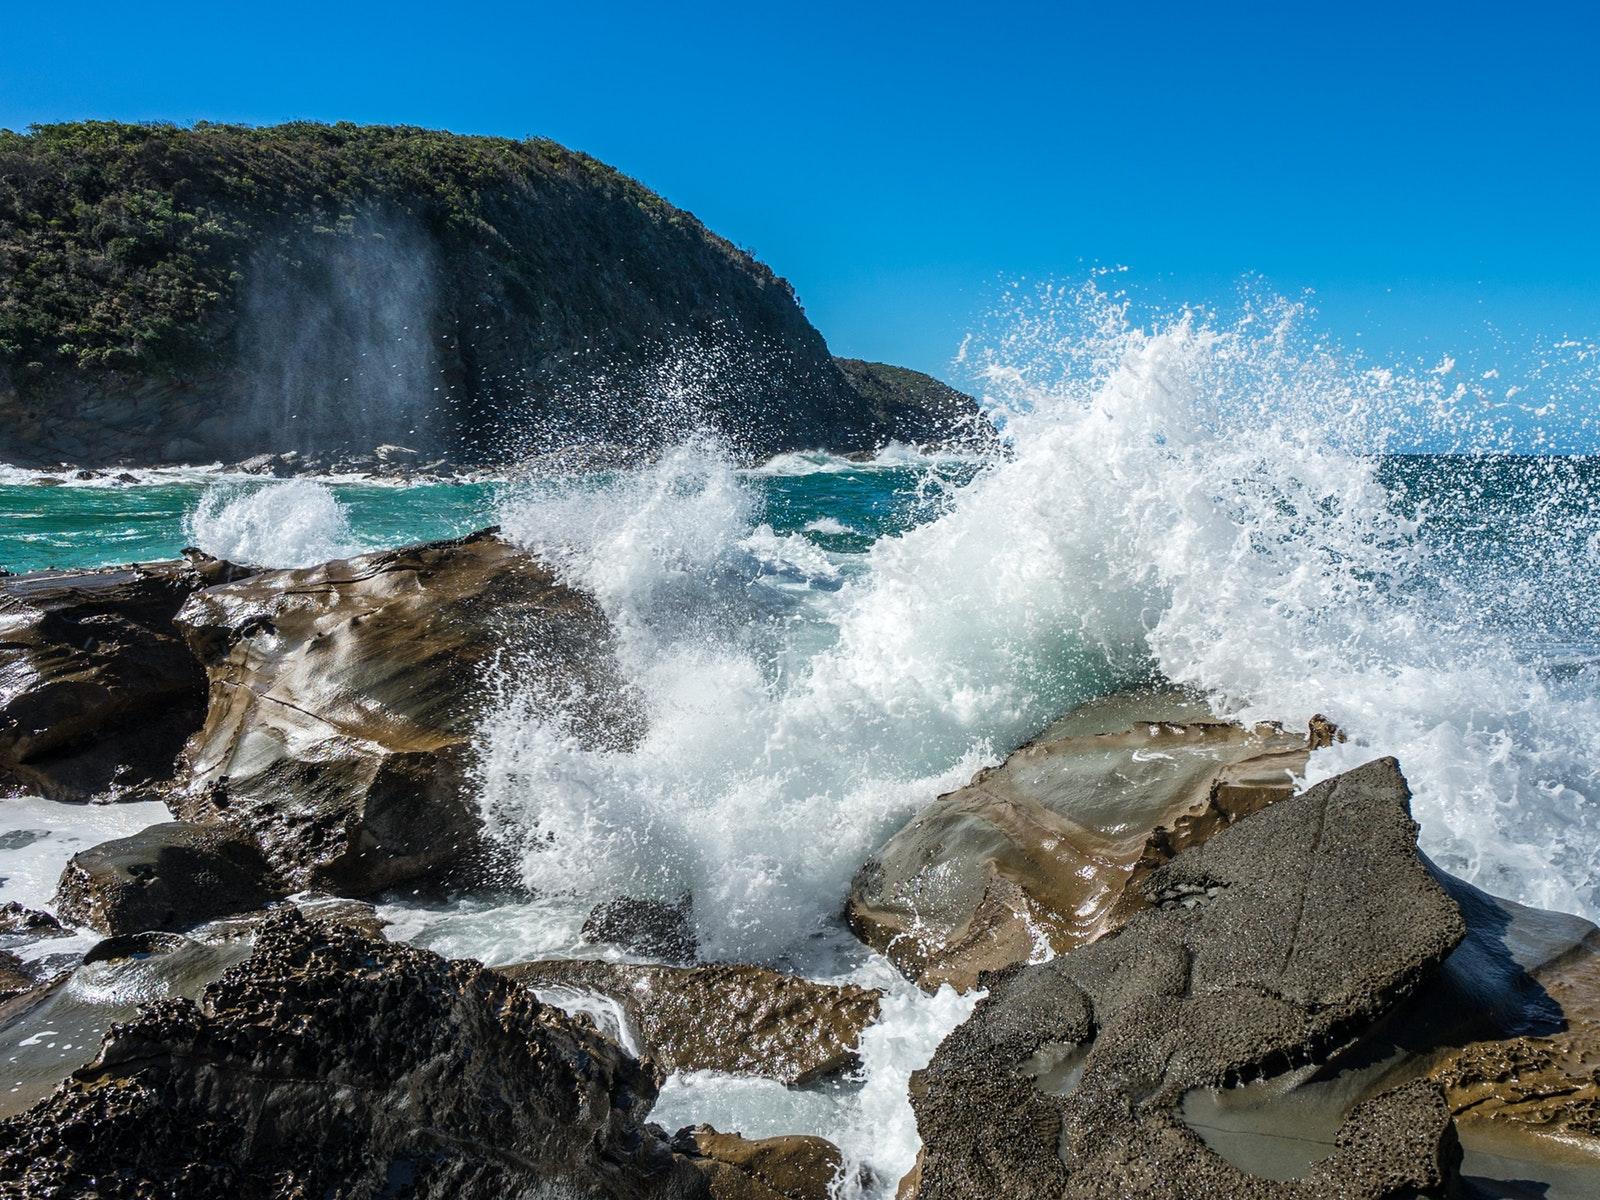 Sunny day at Blanket bay, waves crashing on rocks